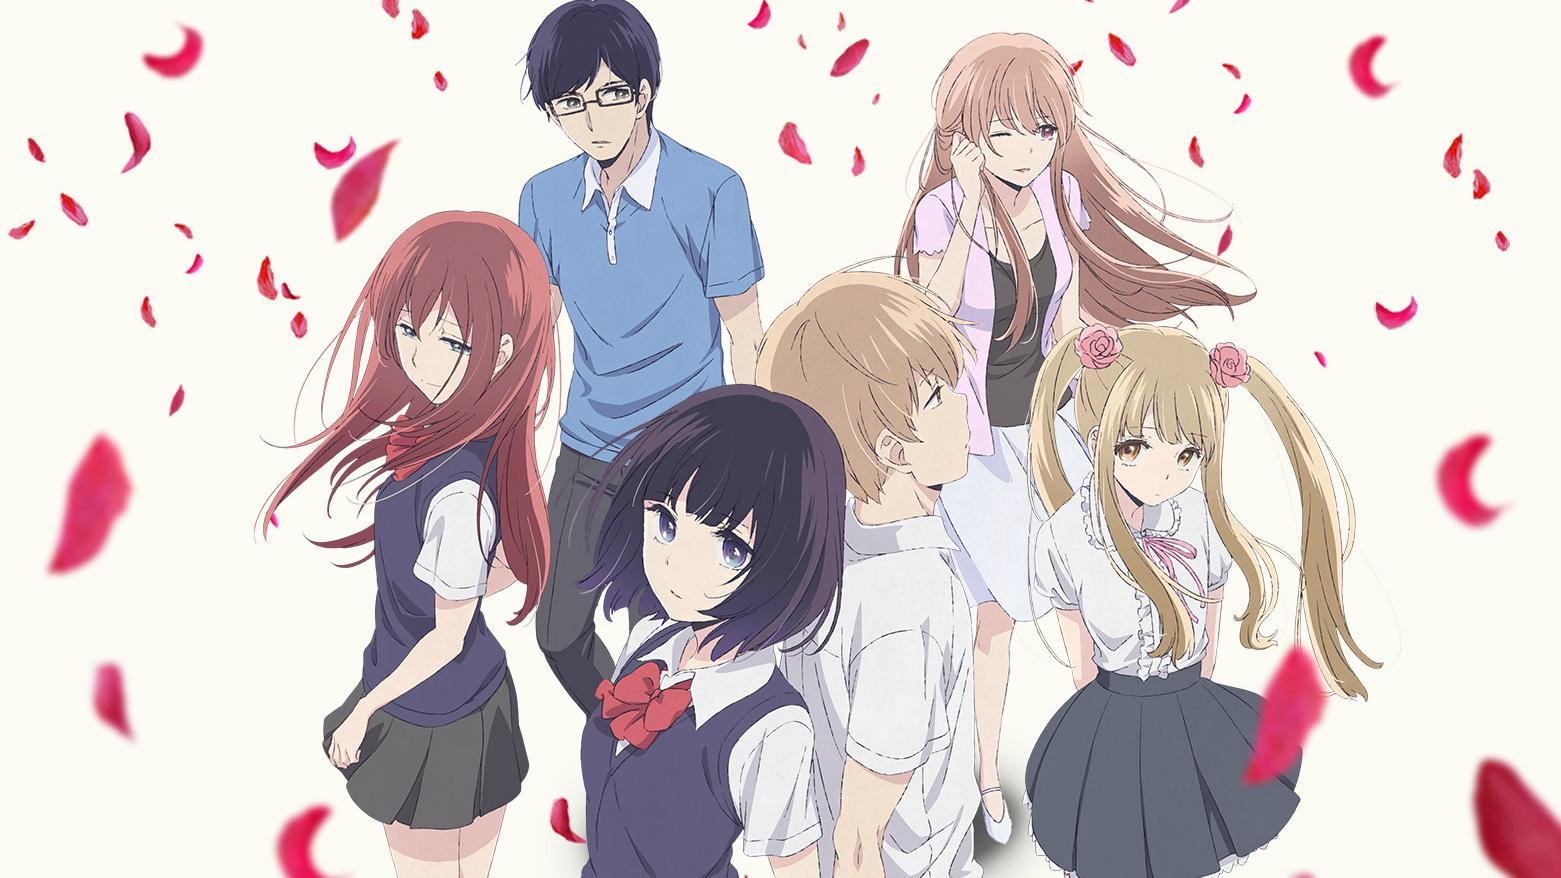 Drama and romance anime like Koikimo, Scum's Wish